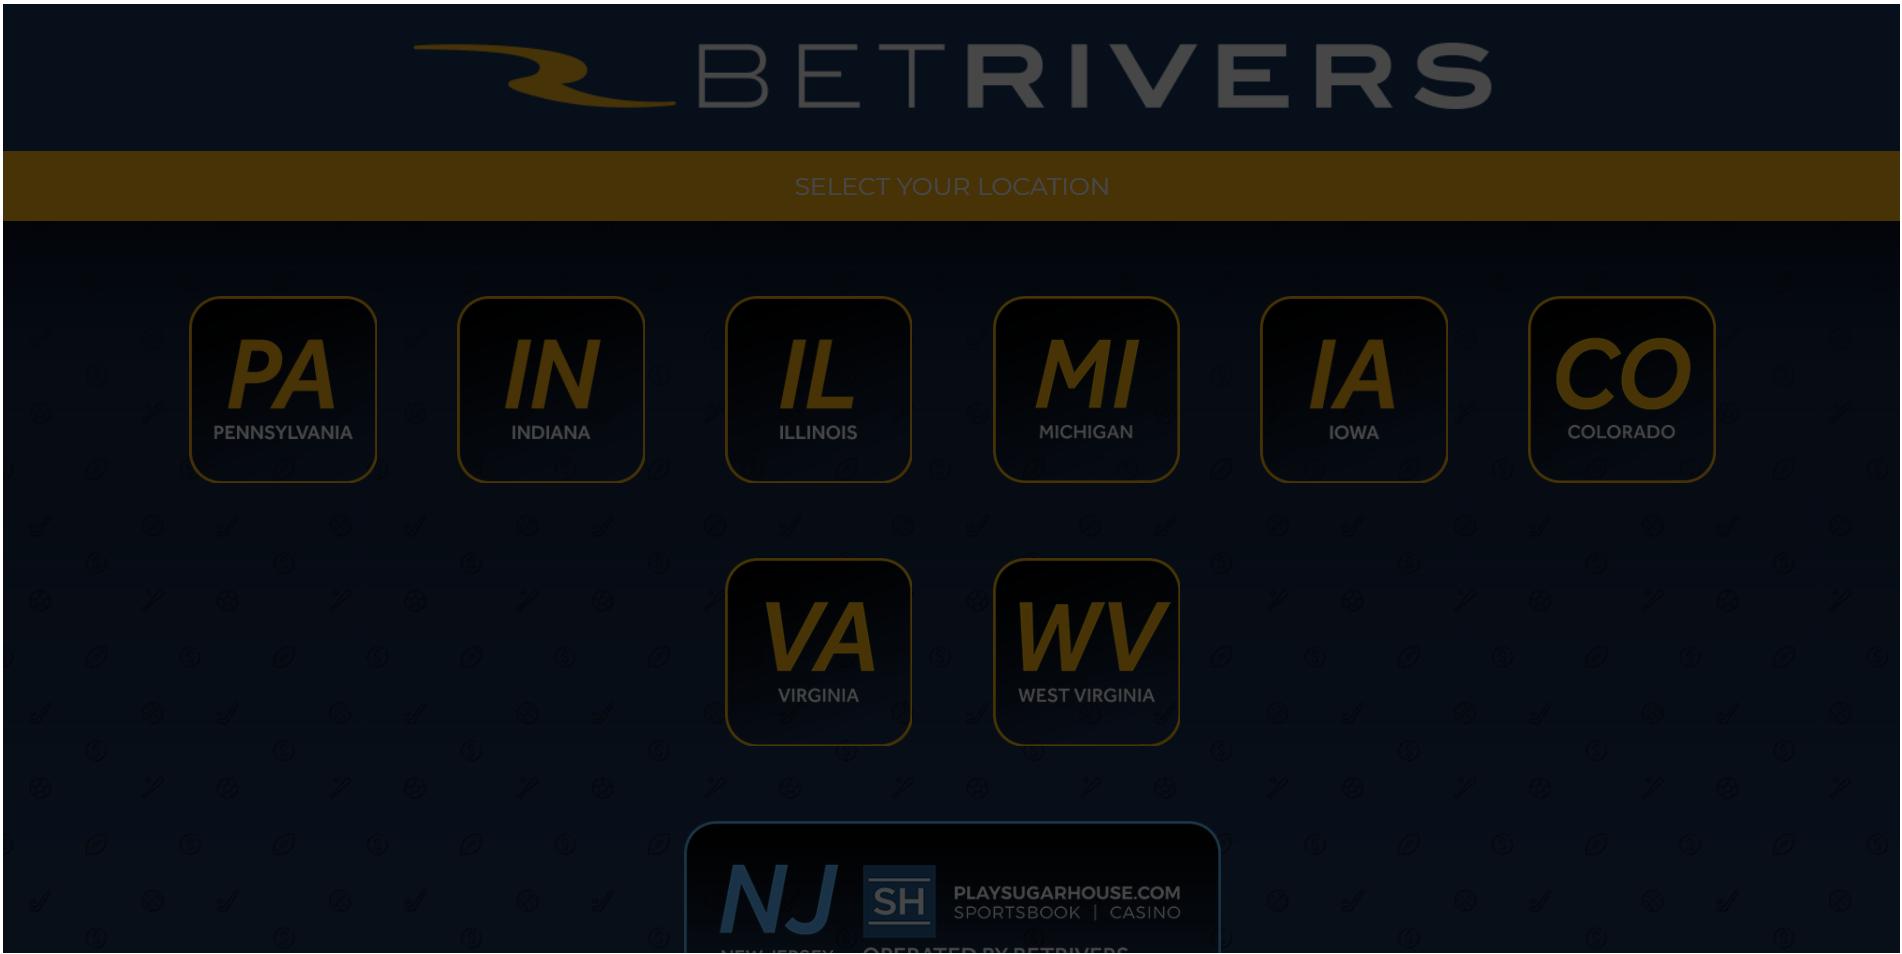 betrivers